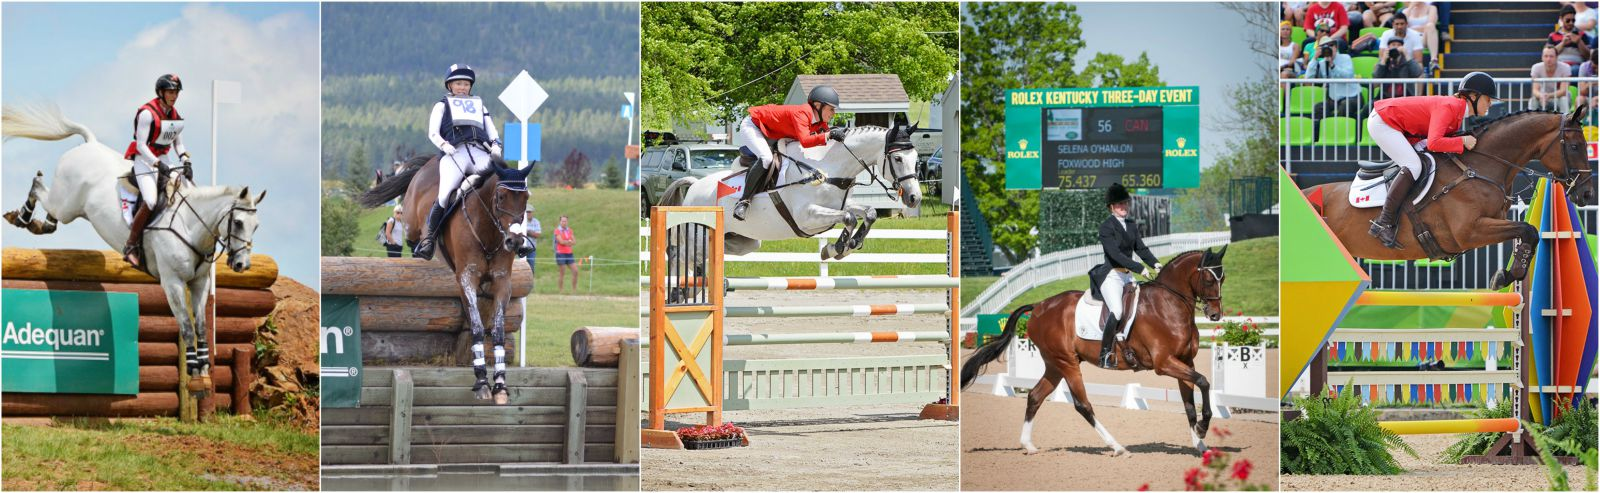 The Equestrian Canada Elite Eventing Squad: Colleen Loach, Hawley Bennett-Awad, Jessica Phoenix, Selena O'Hanlon and Rebecca Howard.